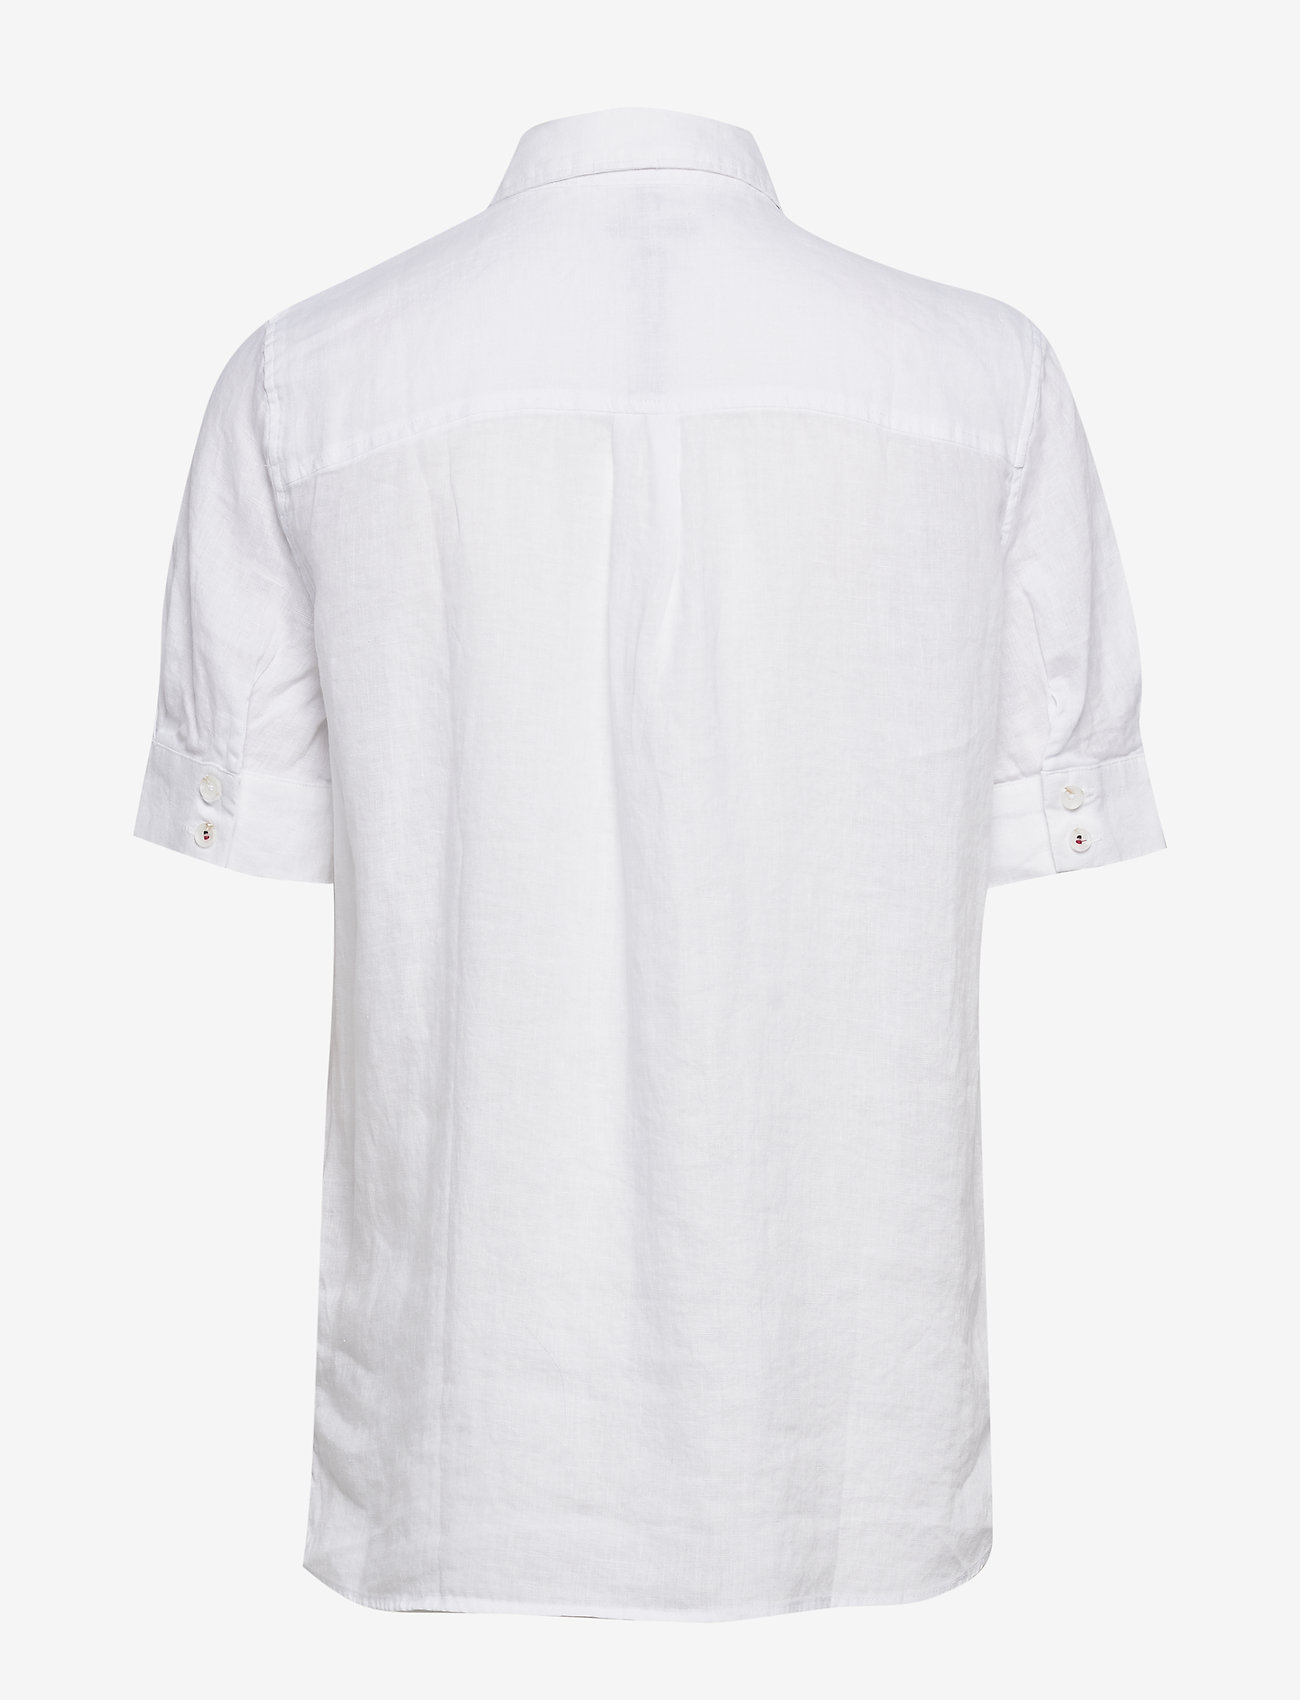 Tommy Hilfiger - TH ESSENTIAL PENELOP - overhemden met korte mouwen - white - 1